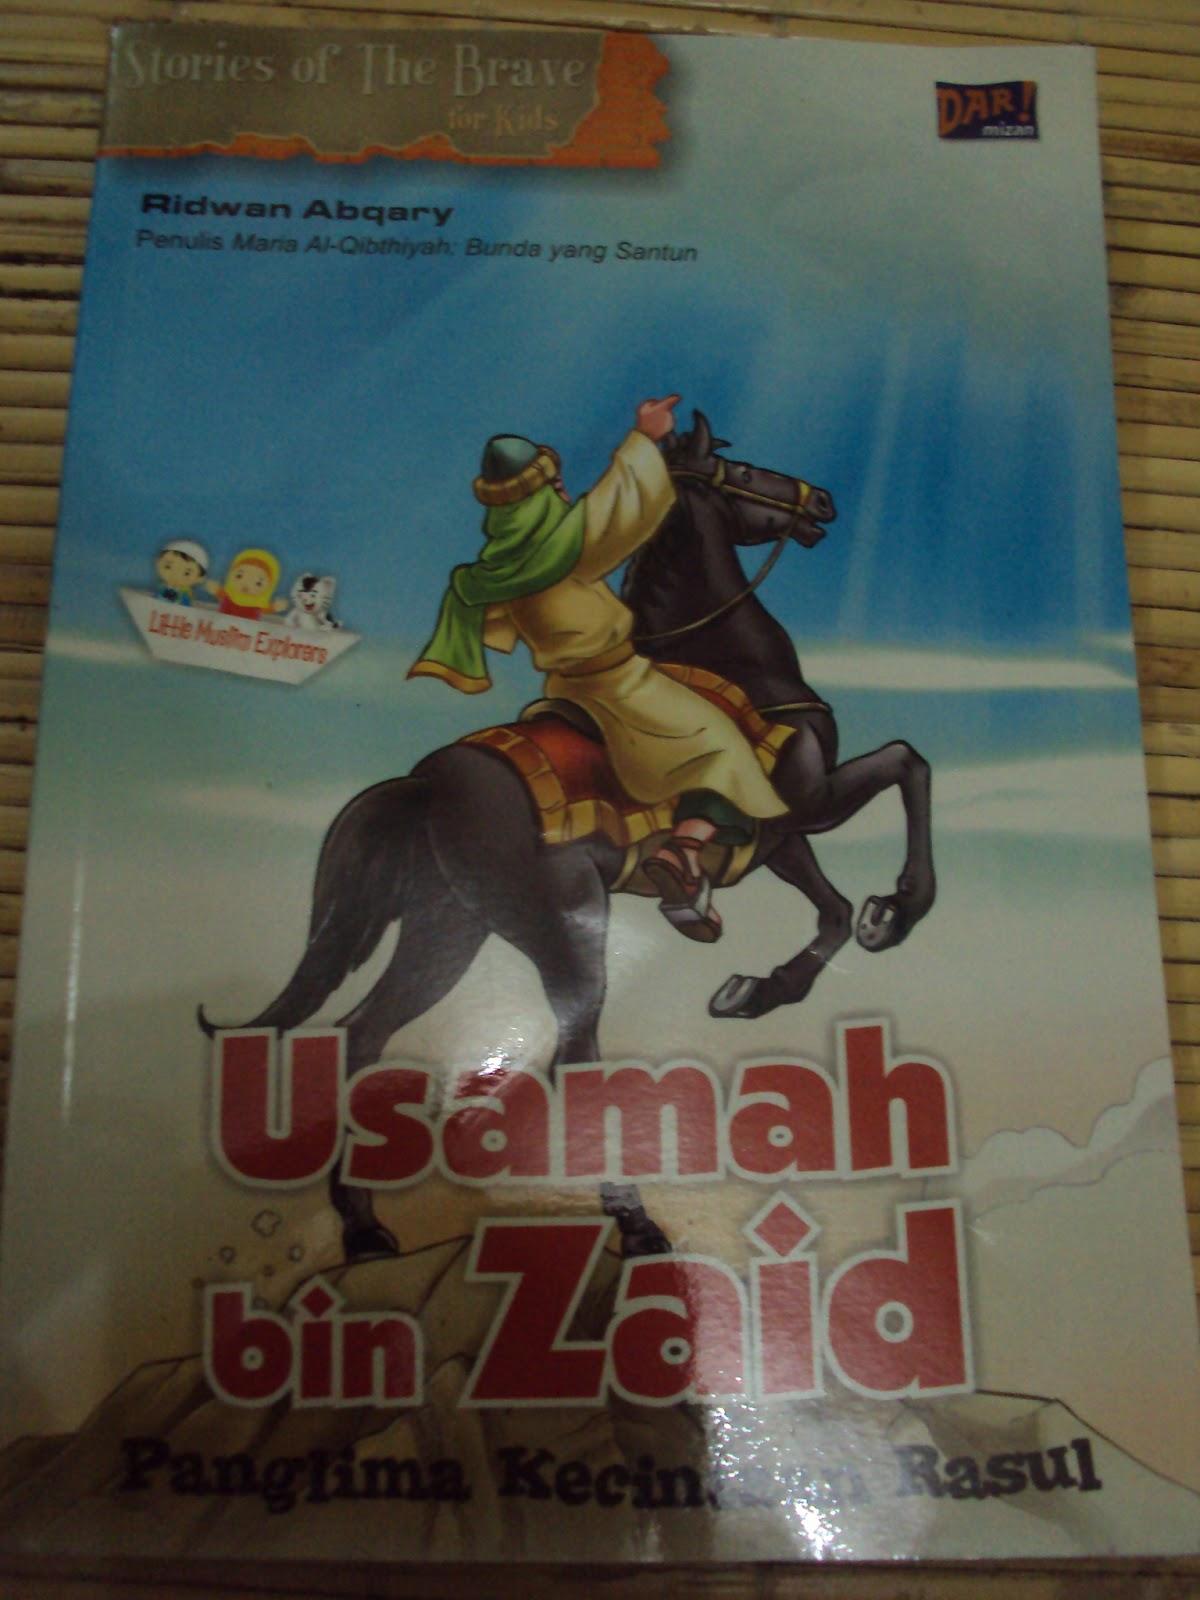 Usamah Bin Zaid Panglima Usamah Bin Zaid Panglima